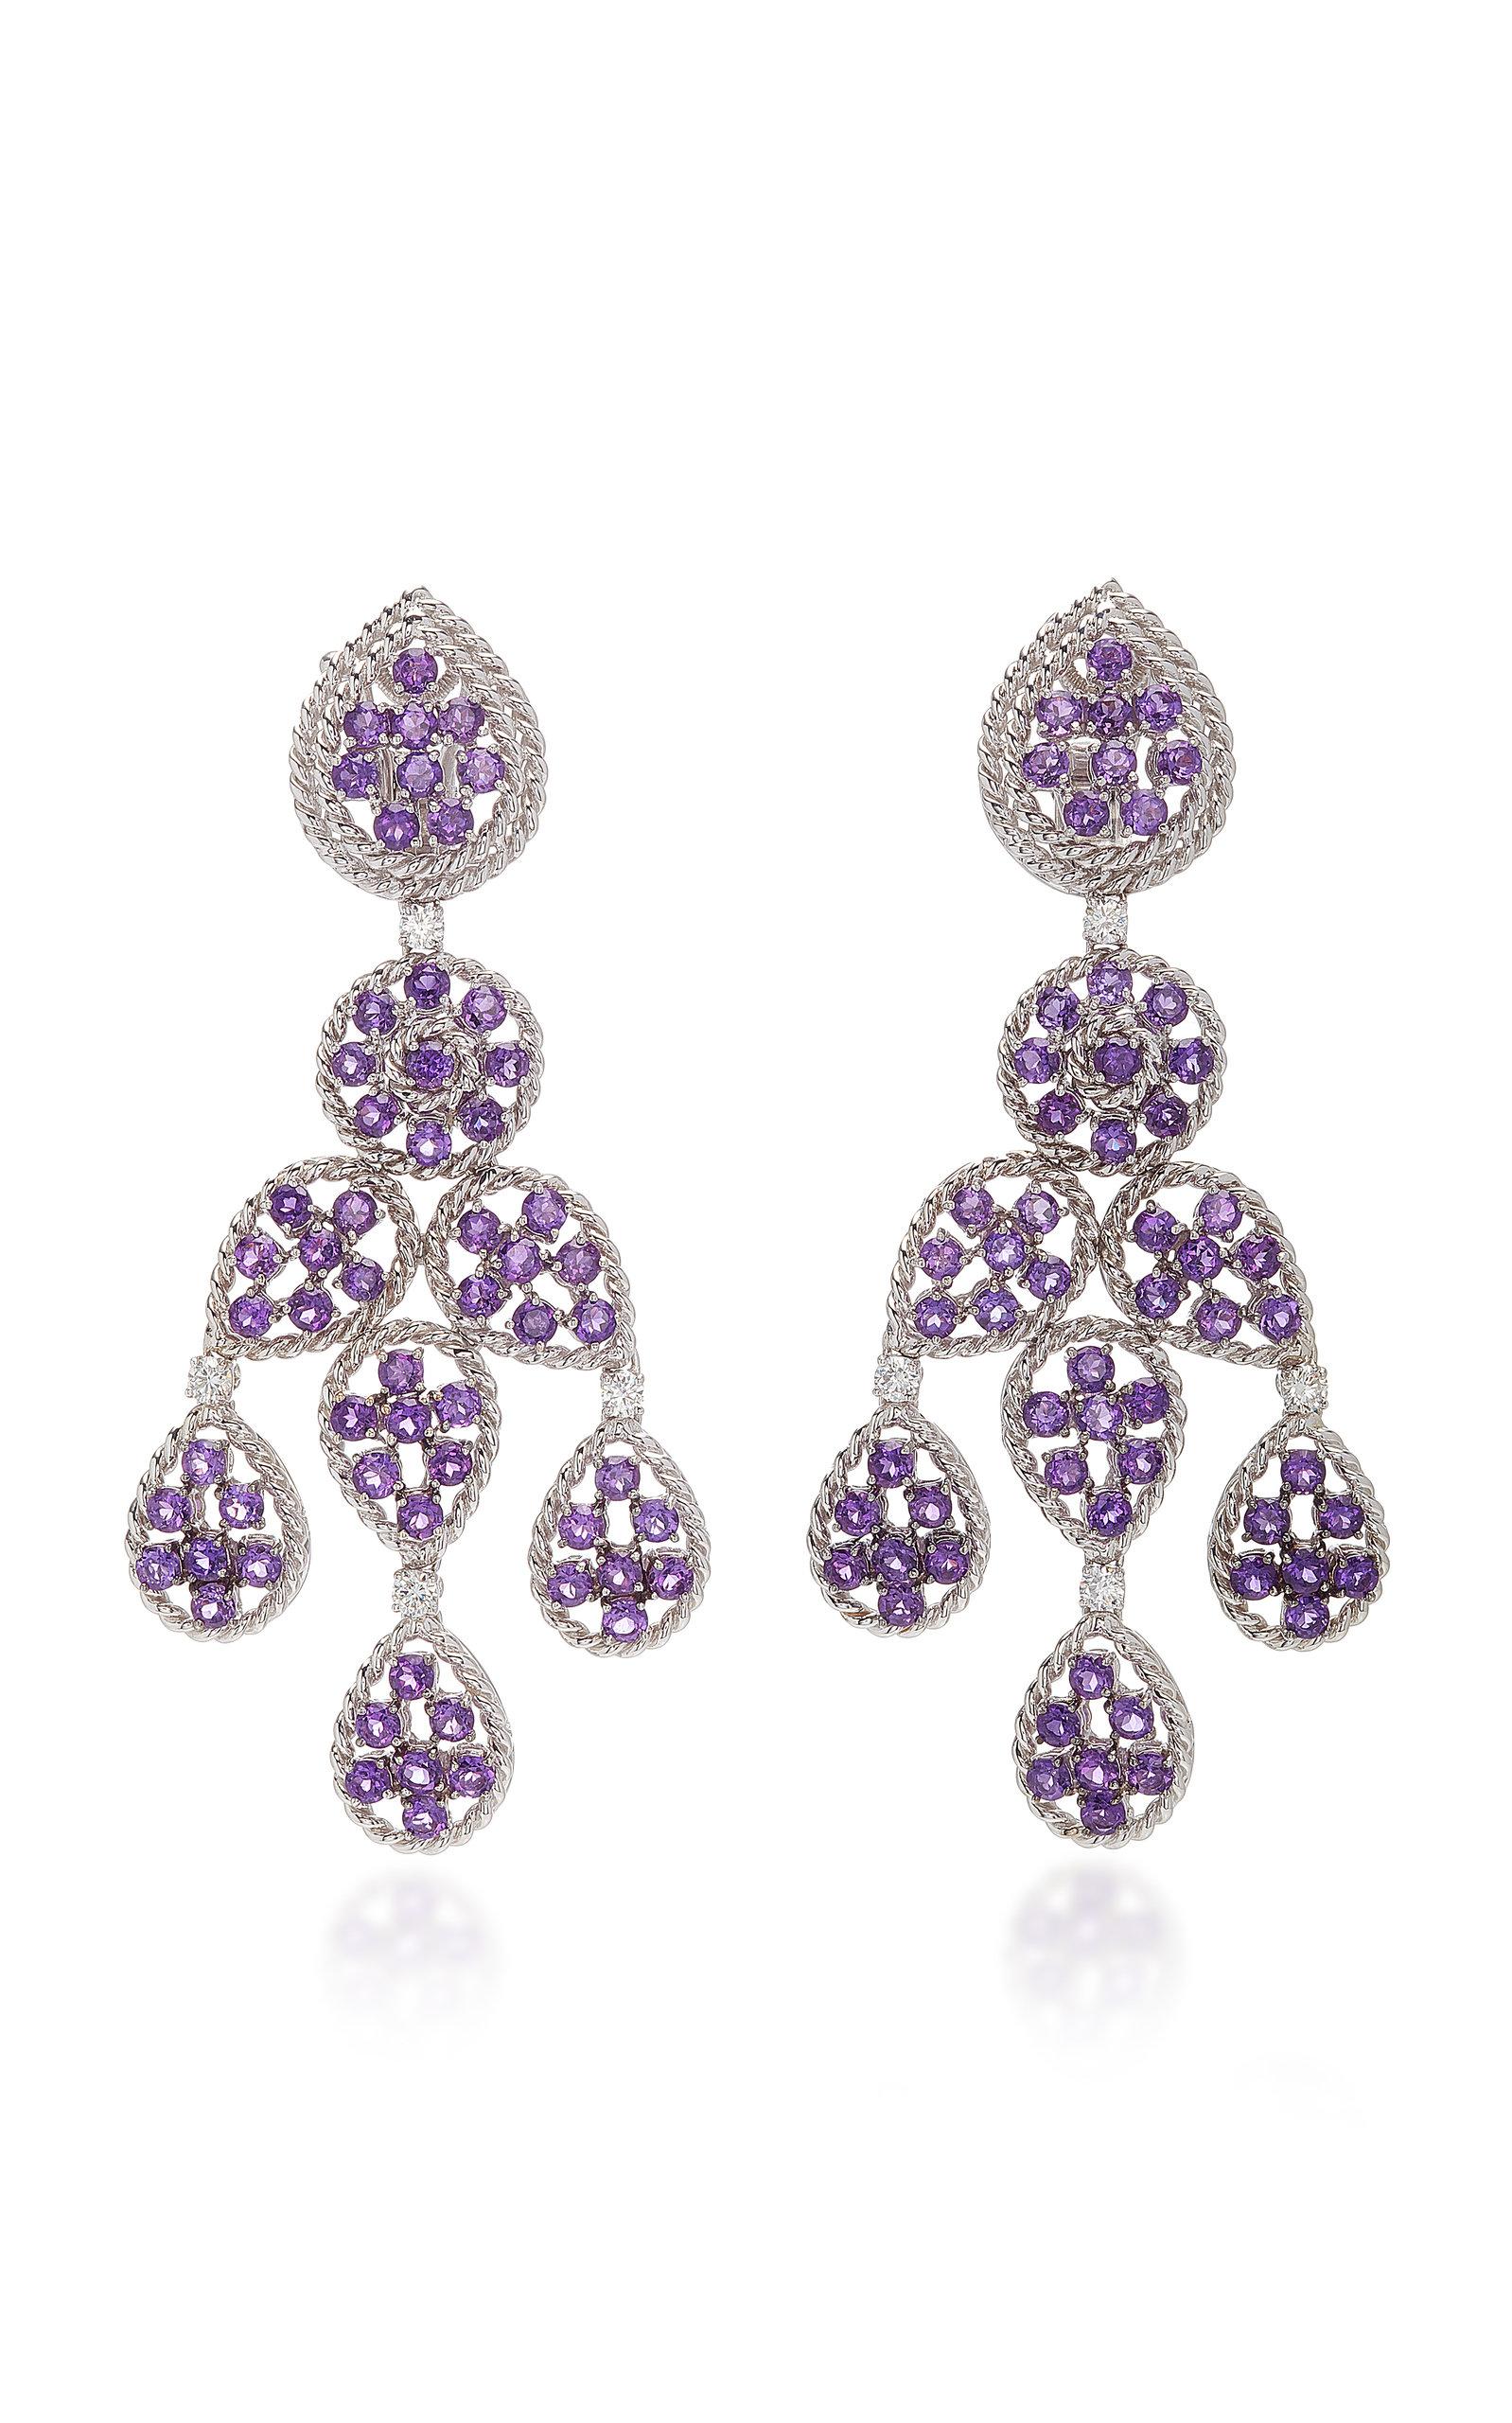 SABBADINI White Gold Amethyst And Diamond Earrings in Purple